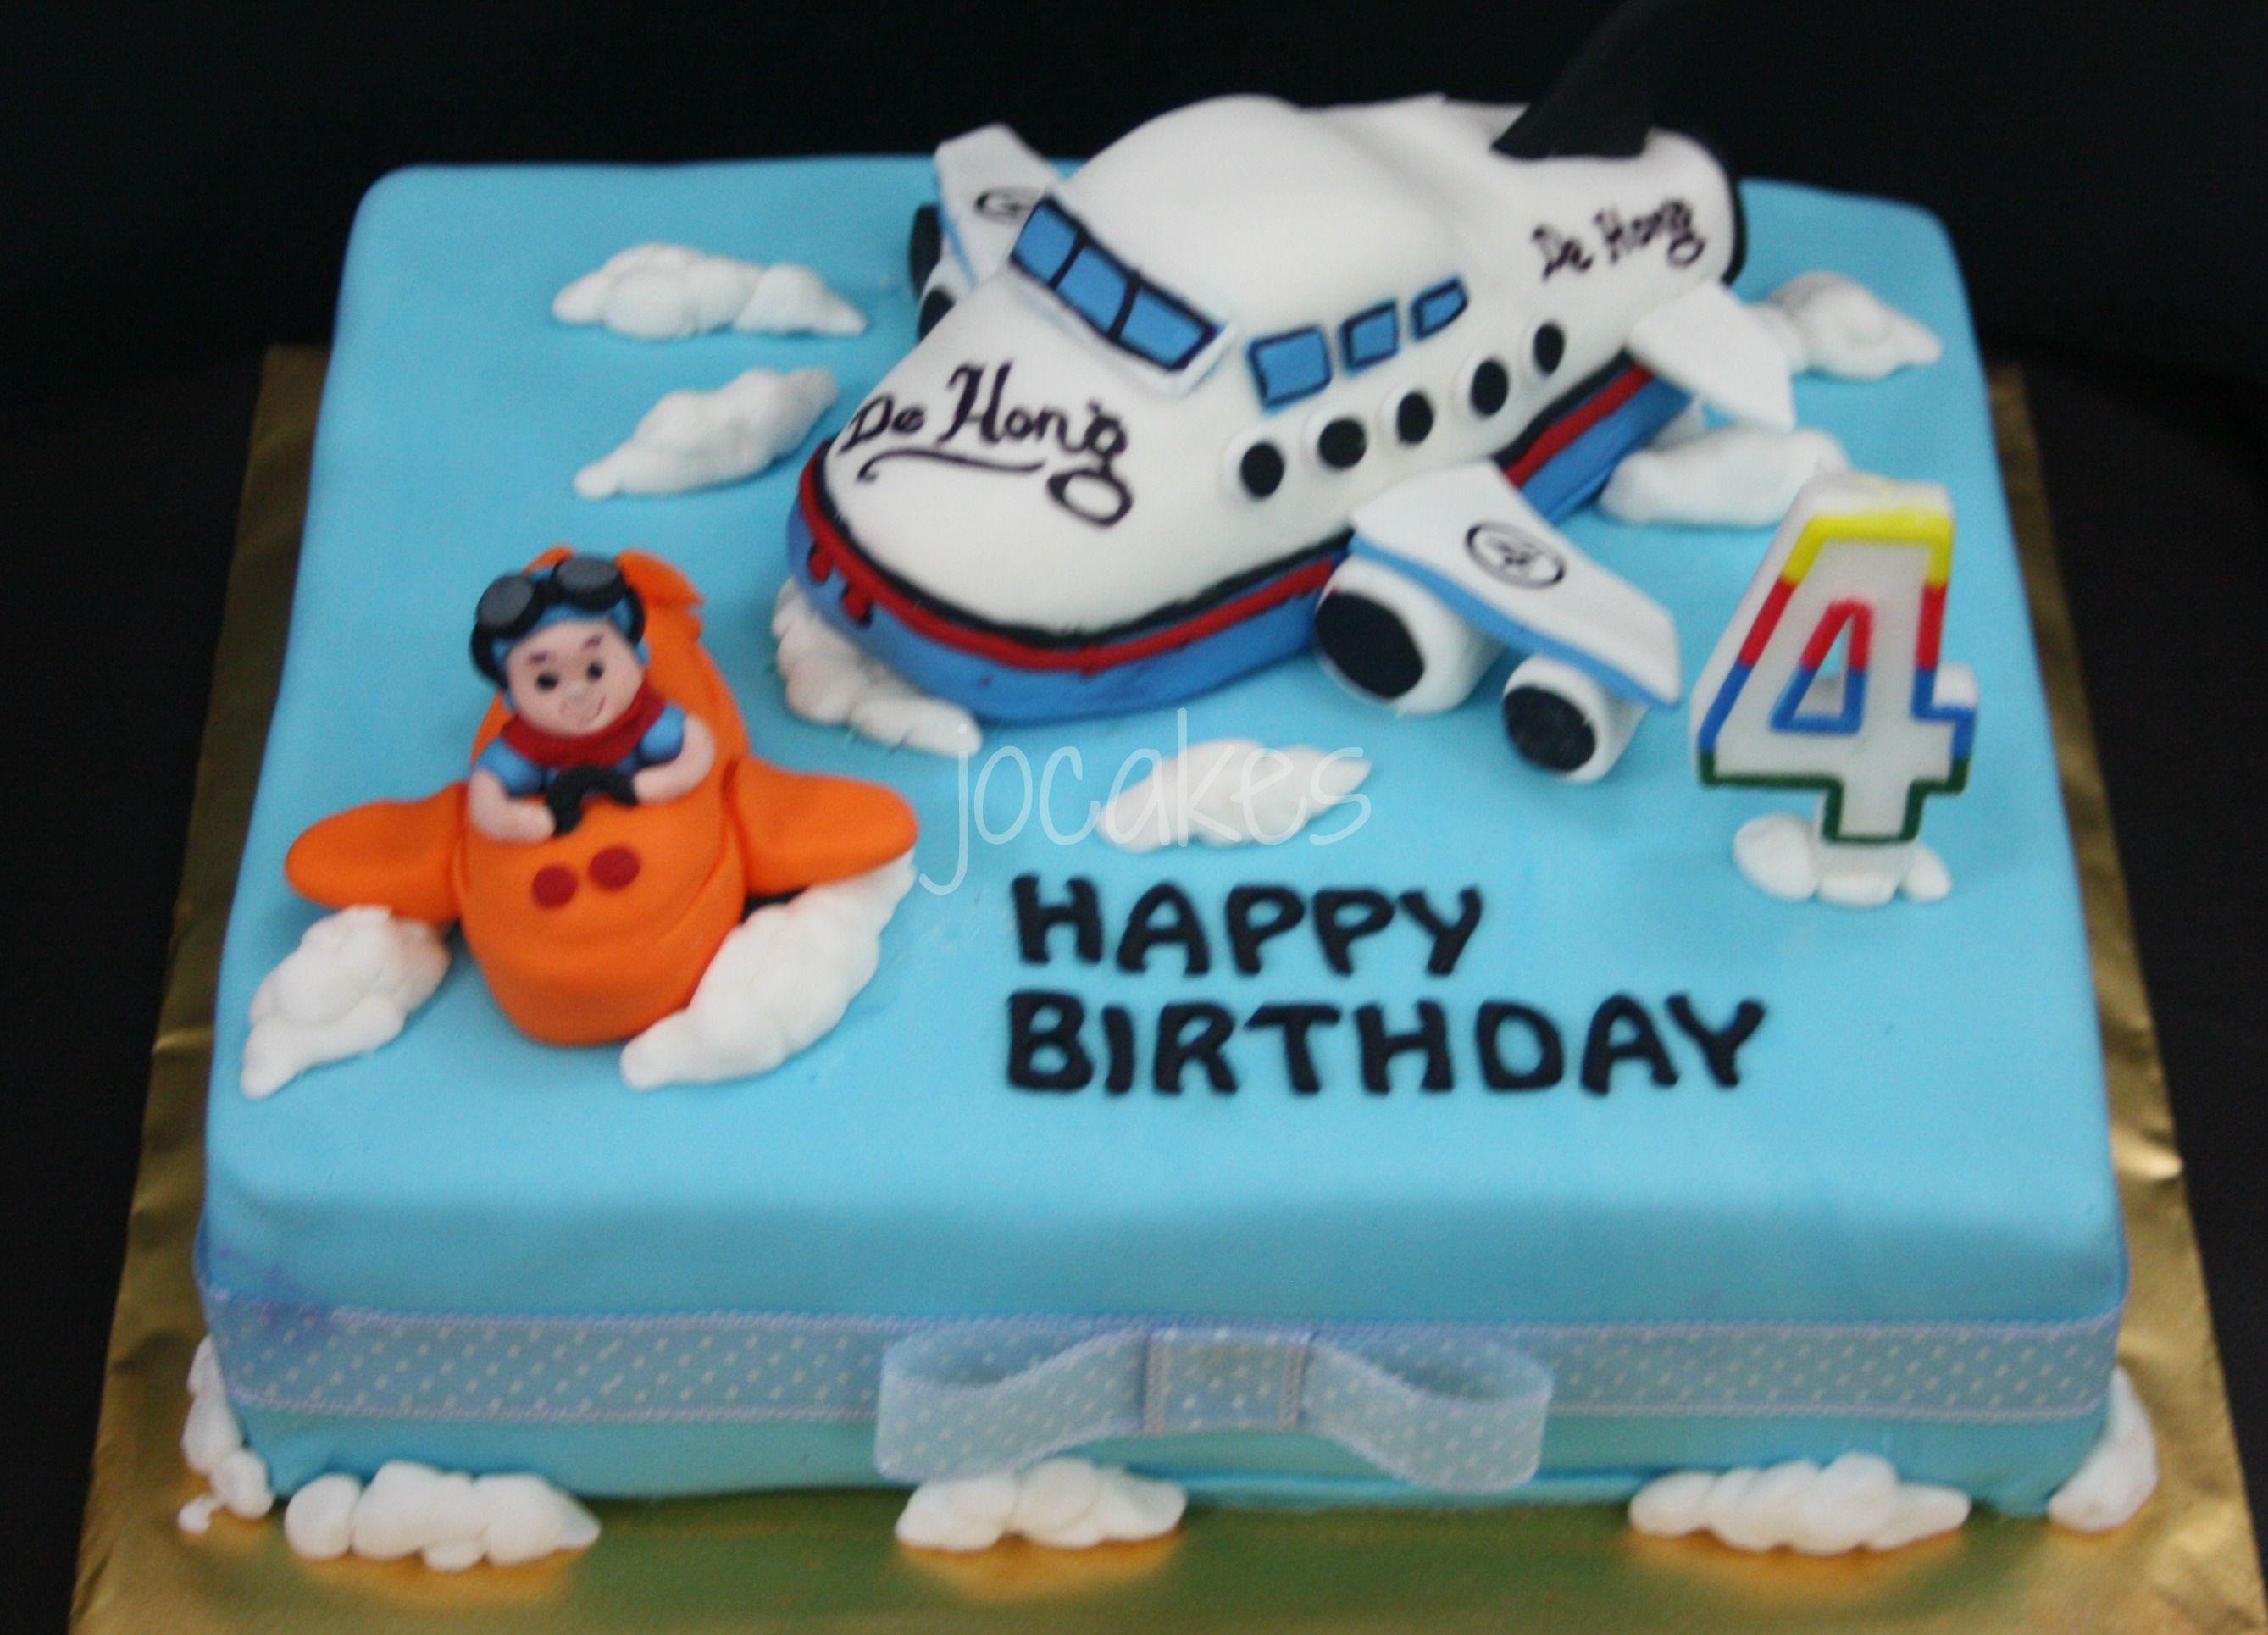 Superb Best Birthday Cakes For 4 Year Olds Goruntuler Ile Pastalar Personalised Birthday Cards Beptaeletsinfo